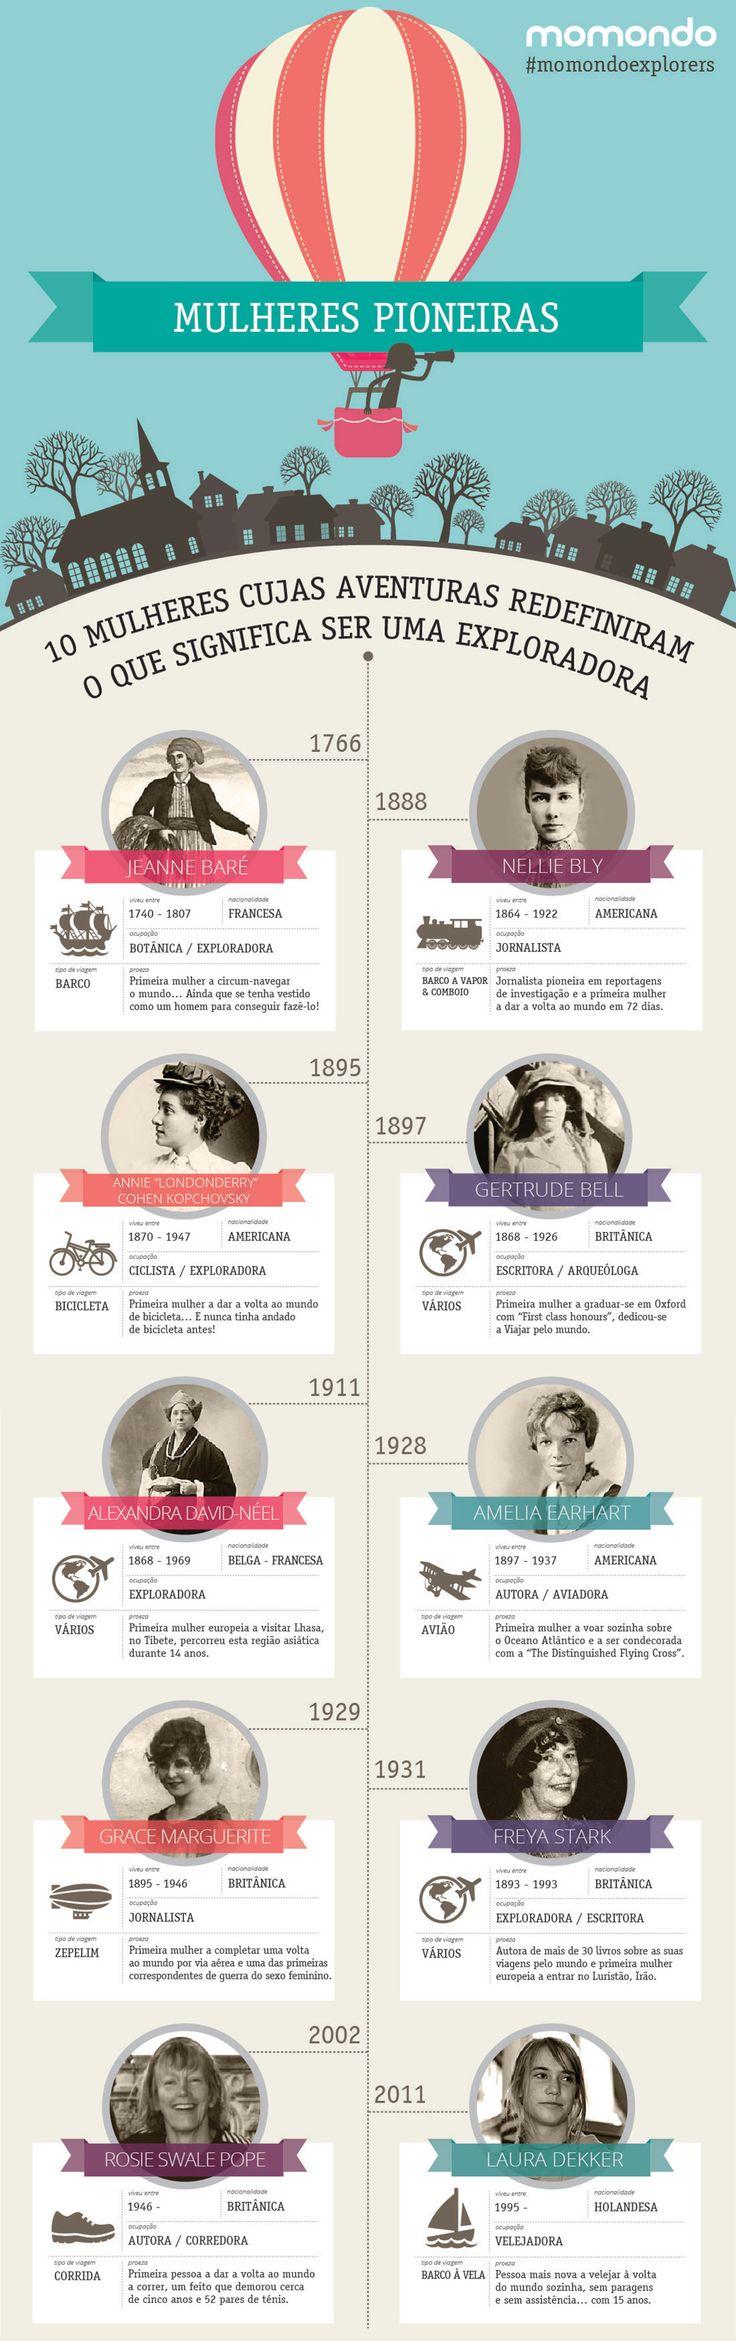 Mulheres Pioneiras